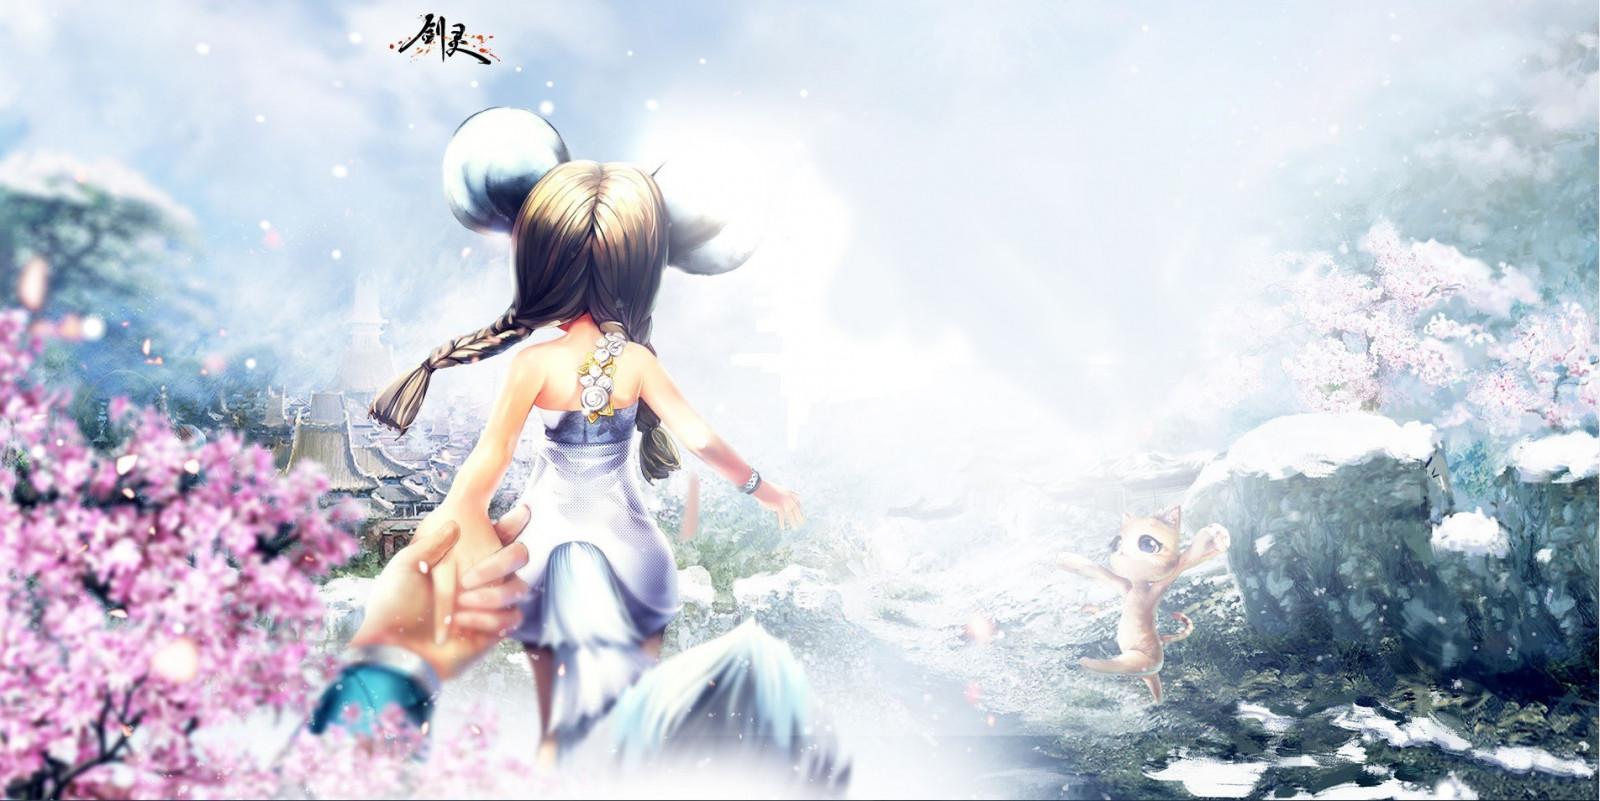 Wallpaper : anime, PC gaming, Blade Soul, mythology ...